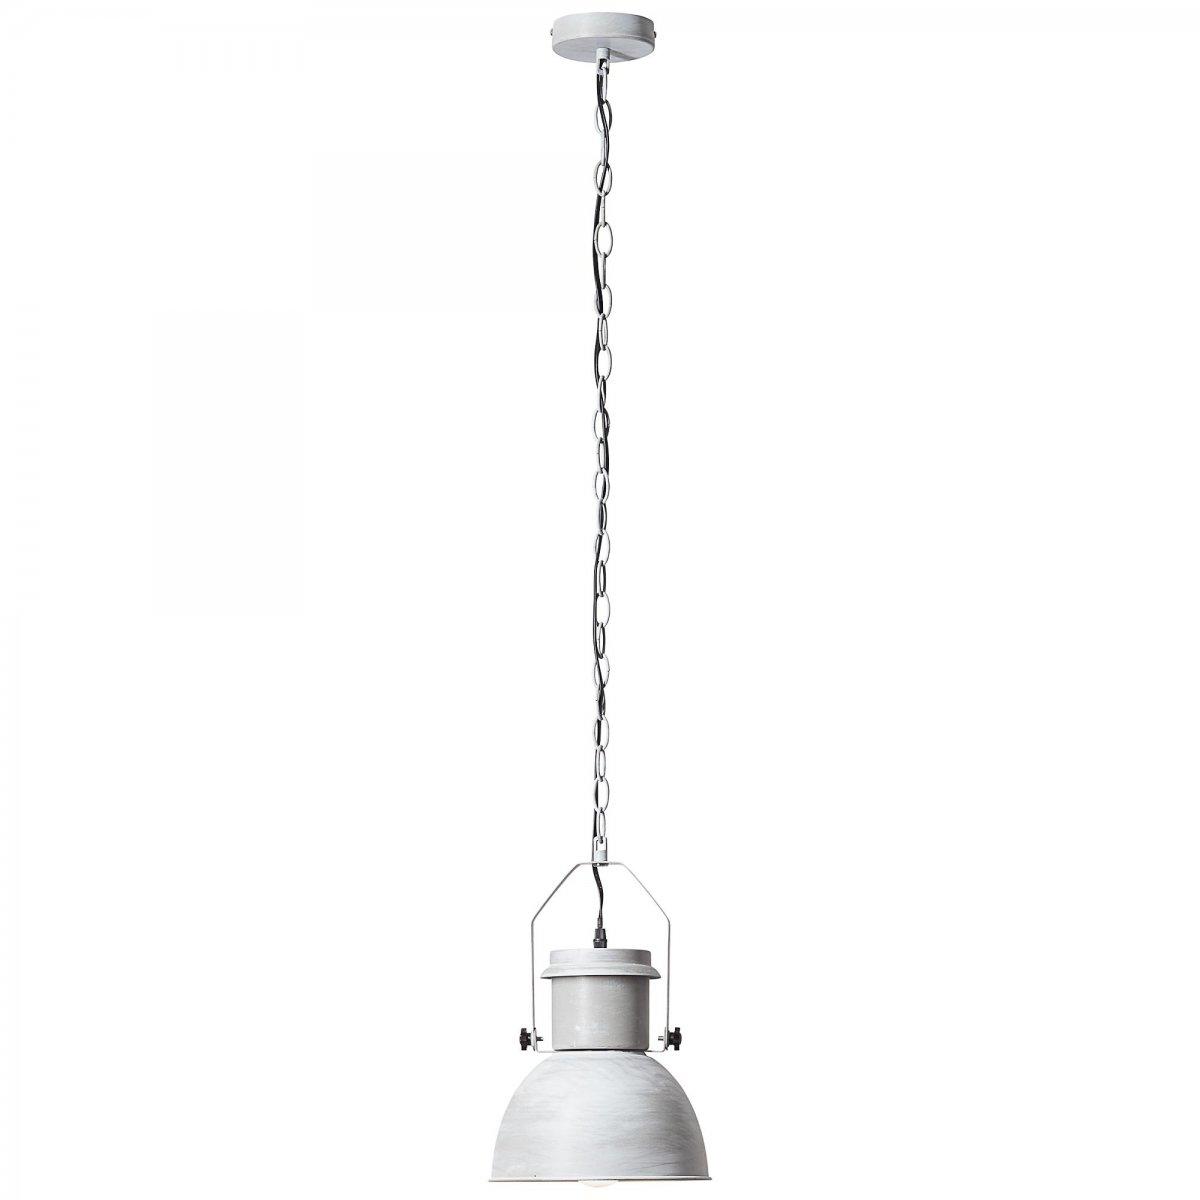 brilliant leuchten no 93590 70 pendelleuchte salford 1 flammig grau beton eur 33 48. Black Bedroom Furniture Sets. Home Design Ideas